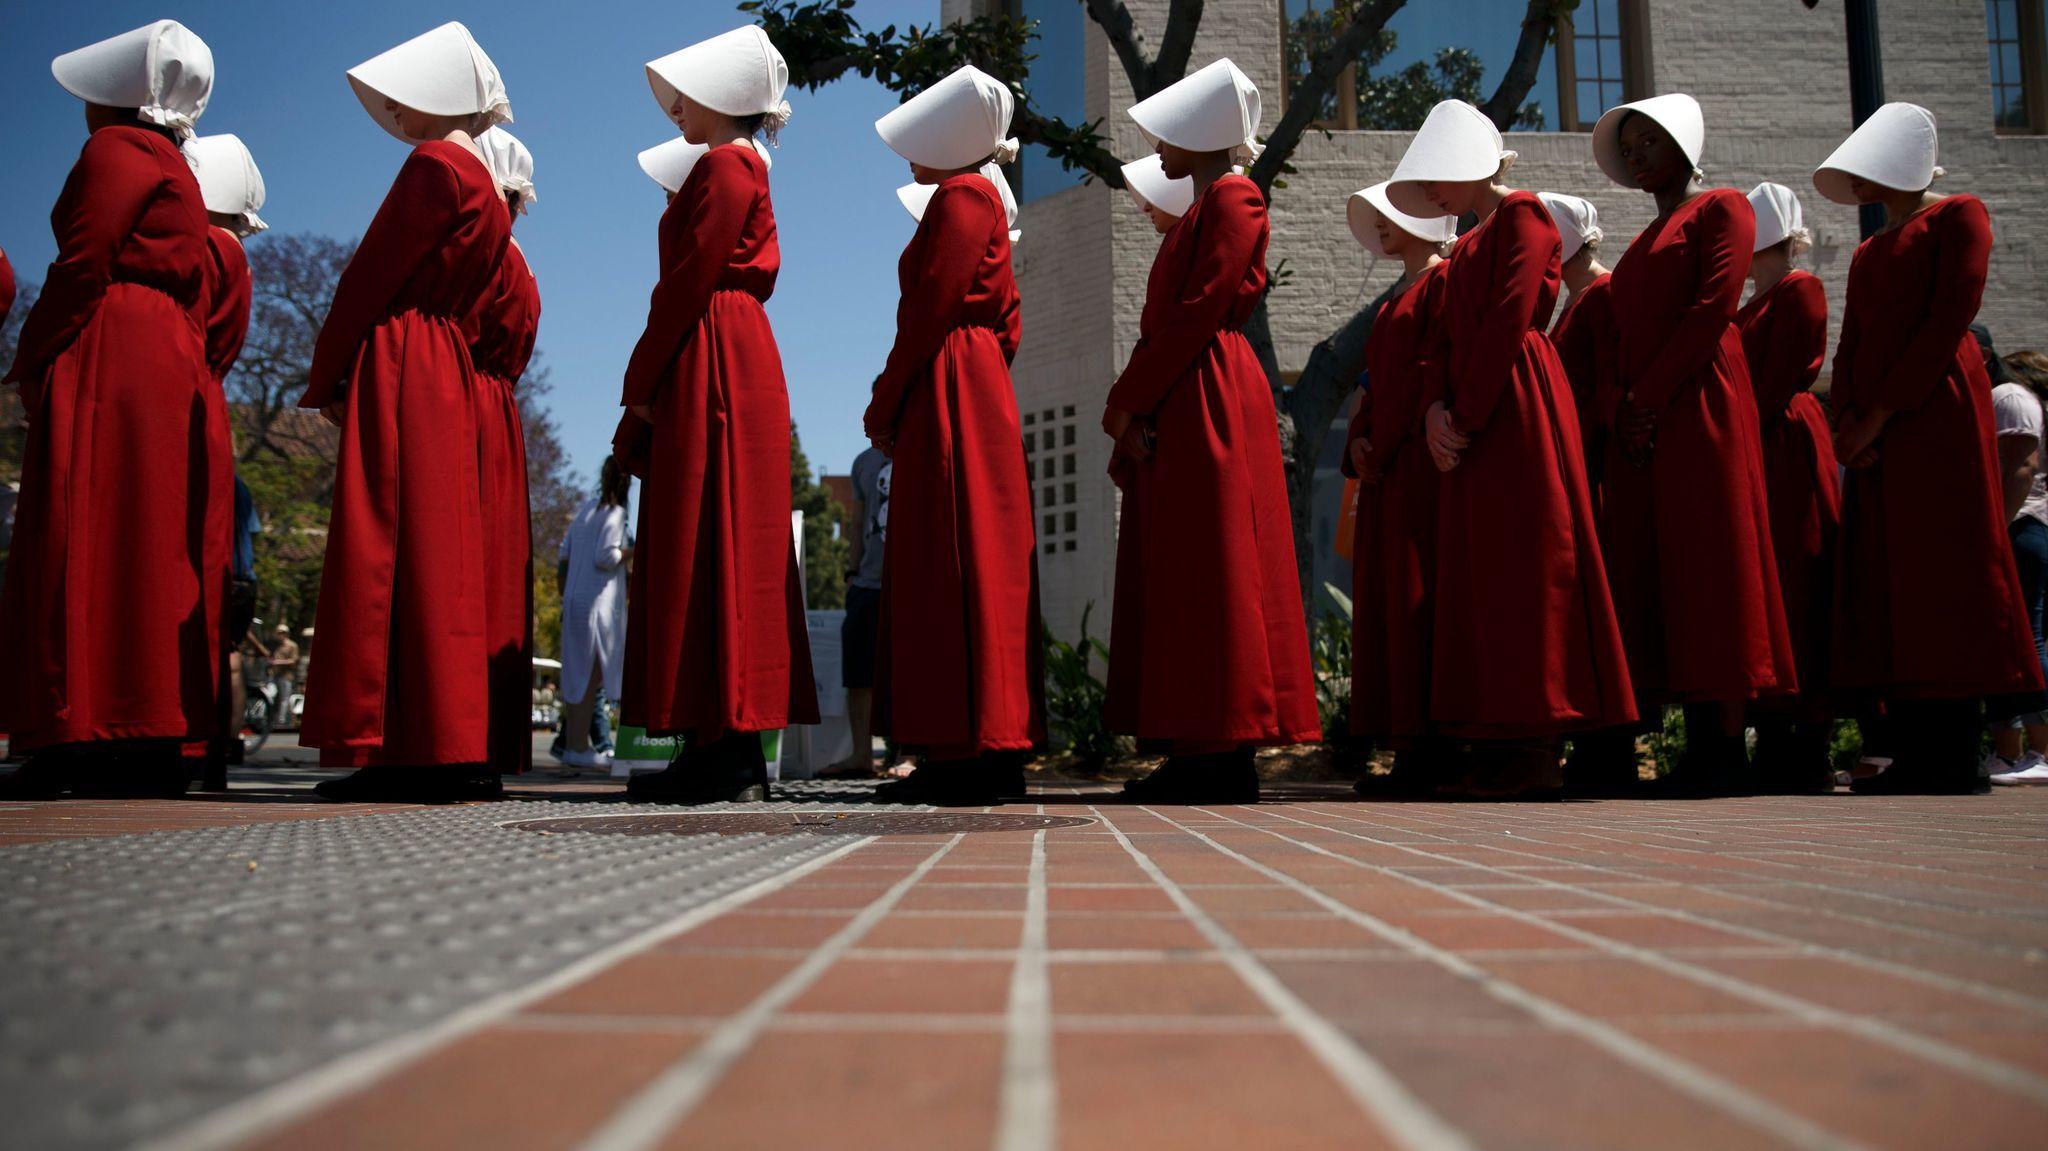 Actresses dressed as Handmaids marketing Hulu's